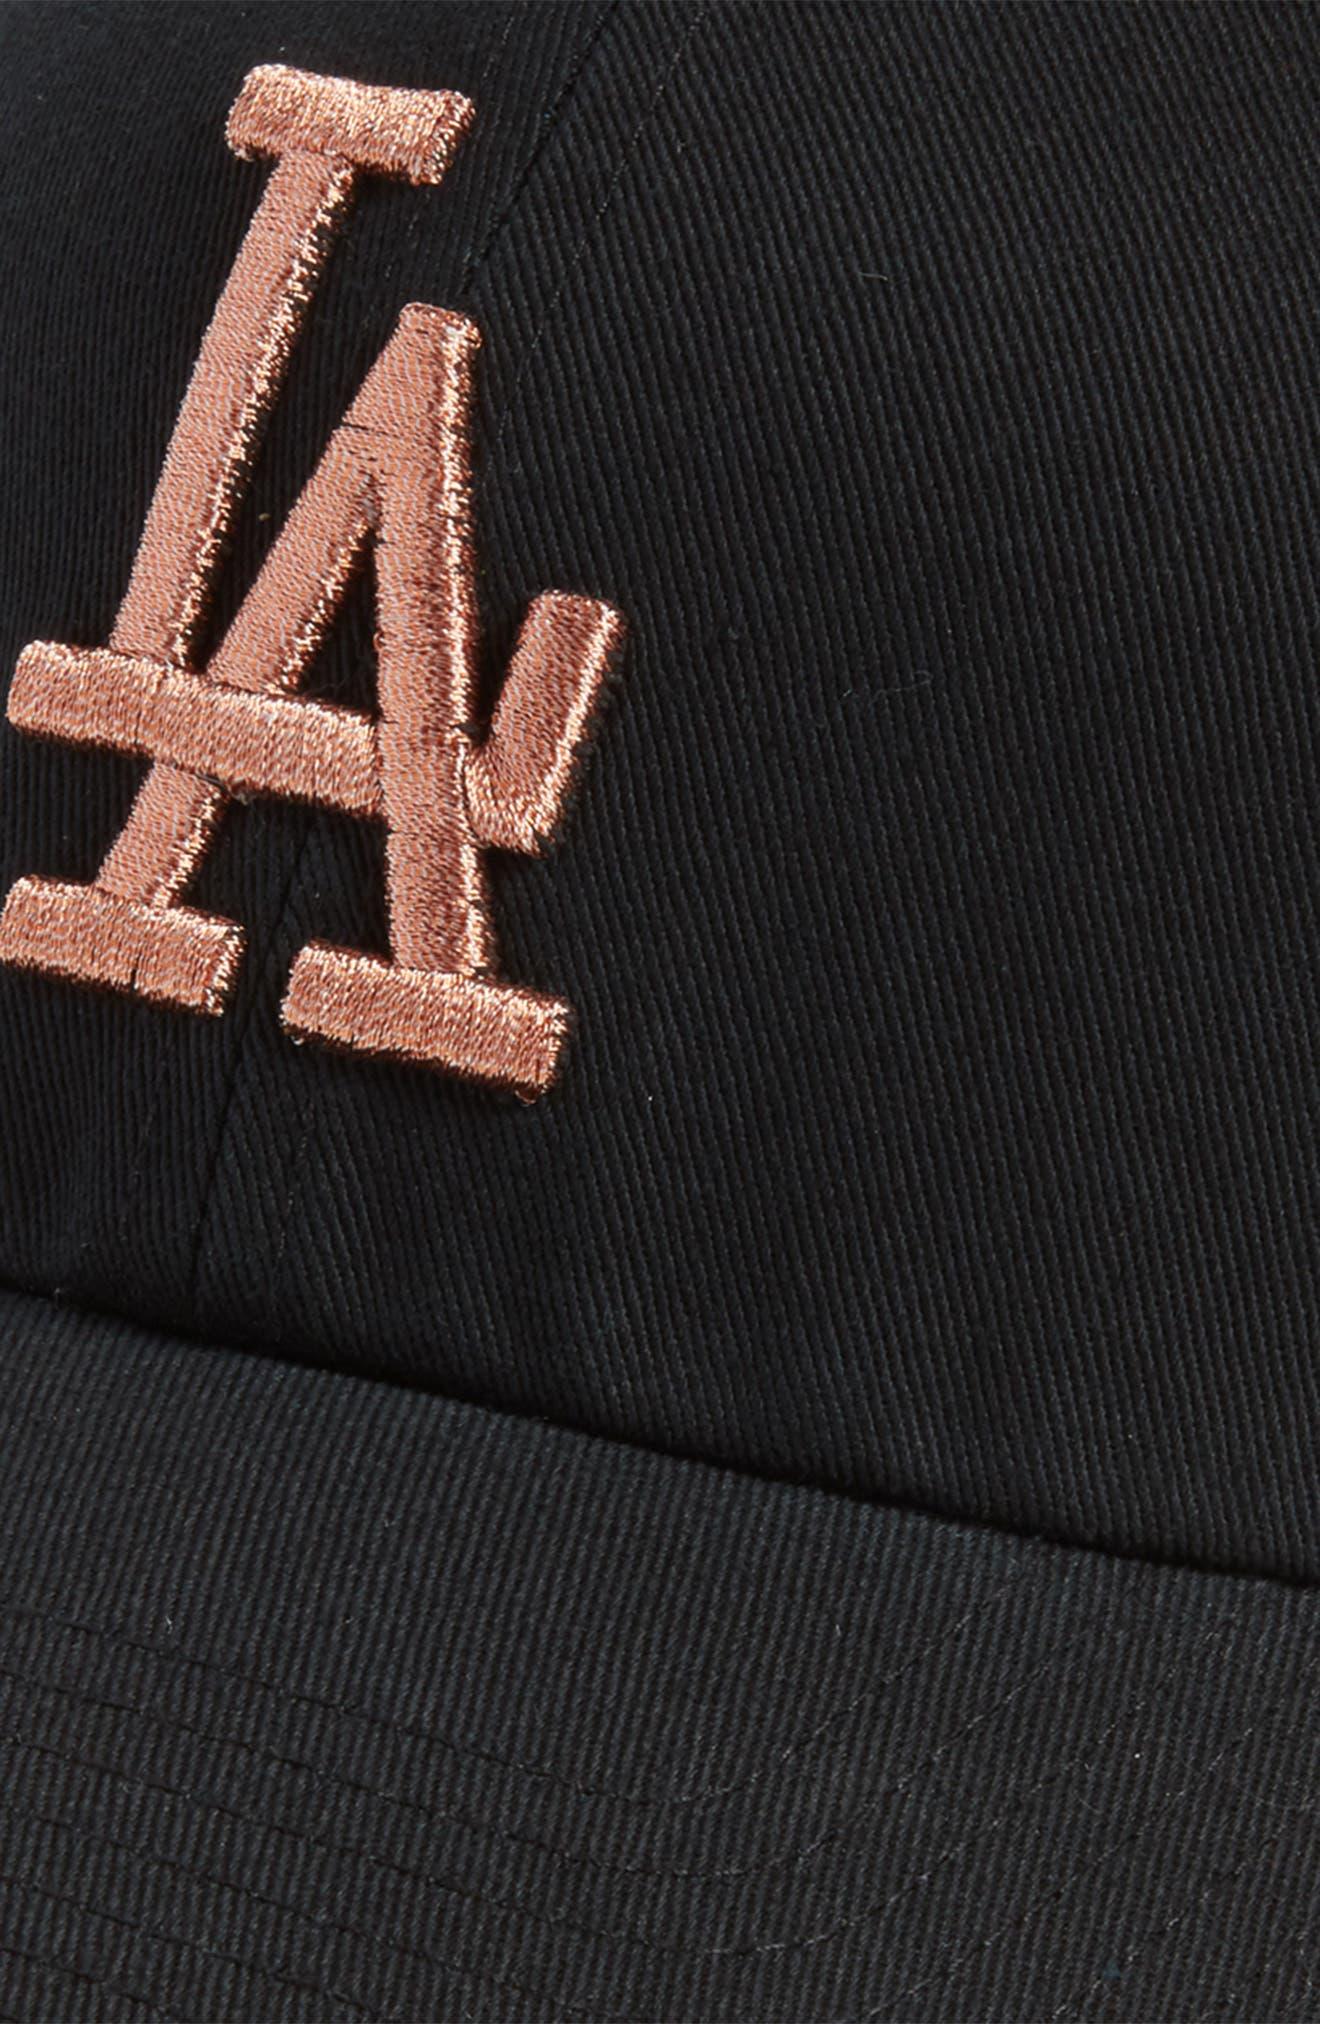 Los Angeles Dodgers Metallic Embroidery Cap,                             Alternate thumbnail 3, color,                             001